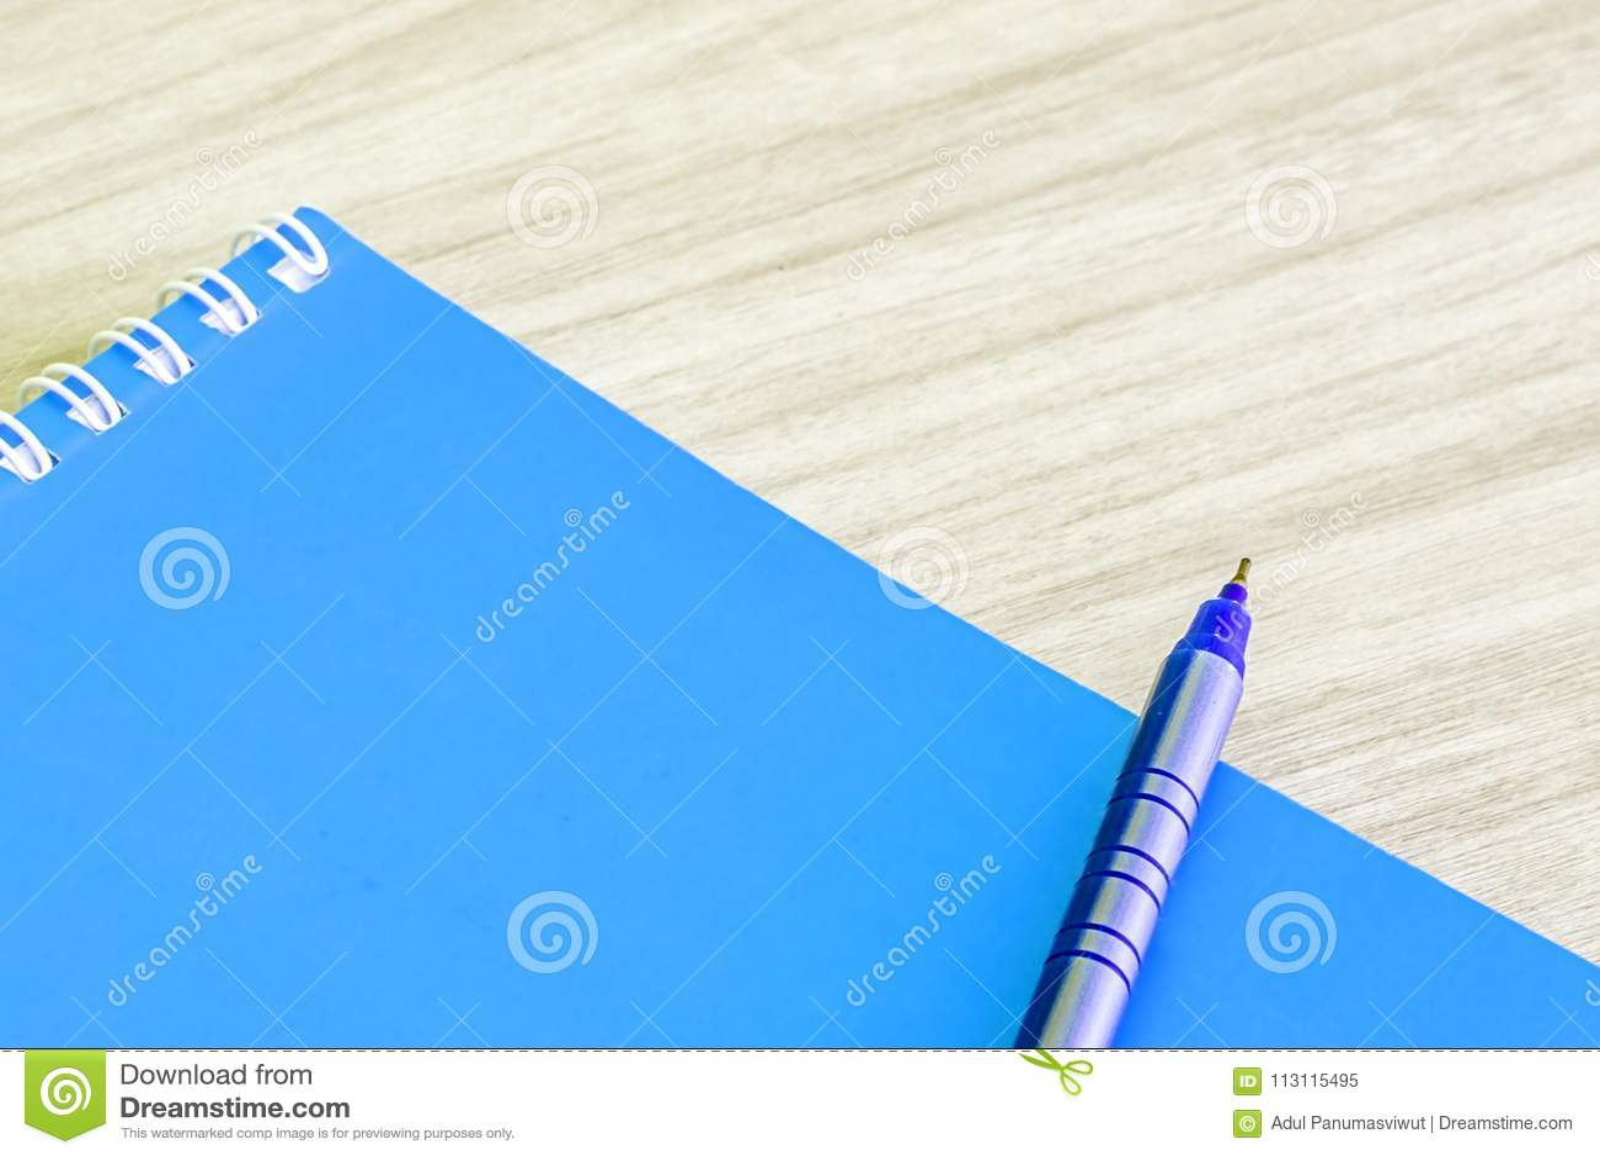 Голубые идеи бизнеса бизнес идеи категории